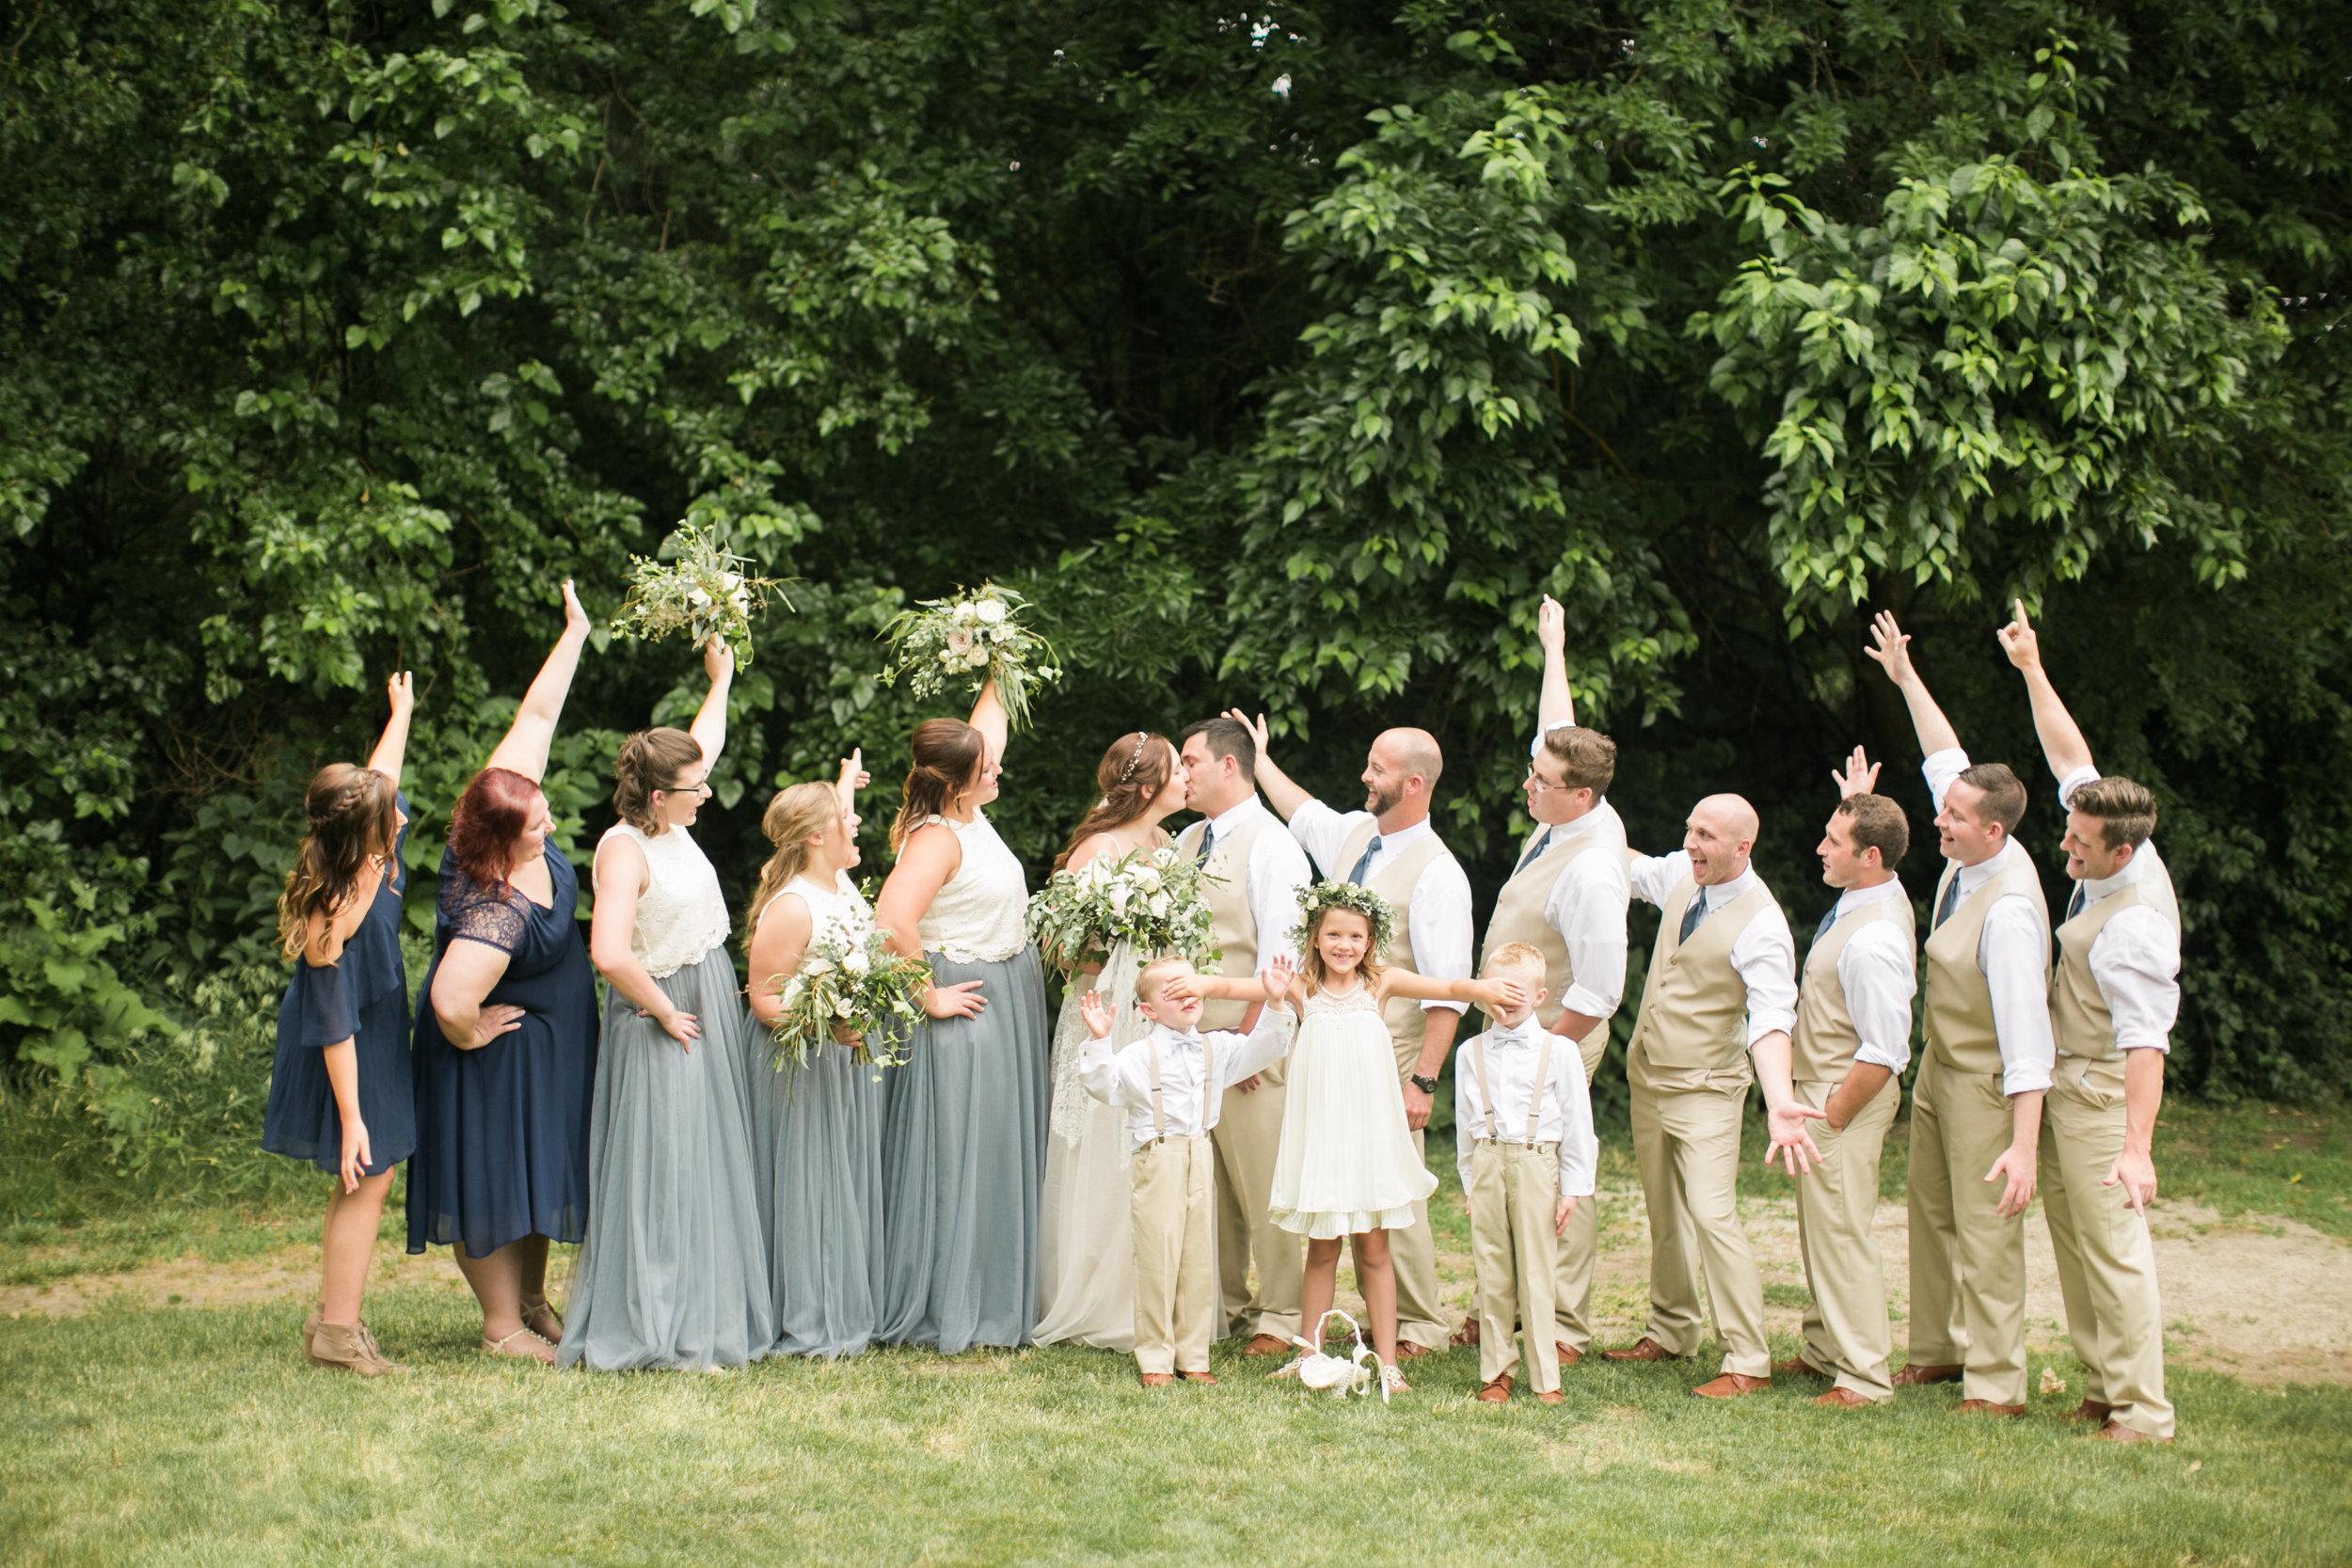 p a n n i e r-wedding party-0099.jpg